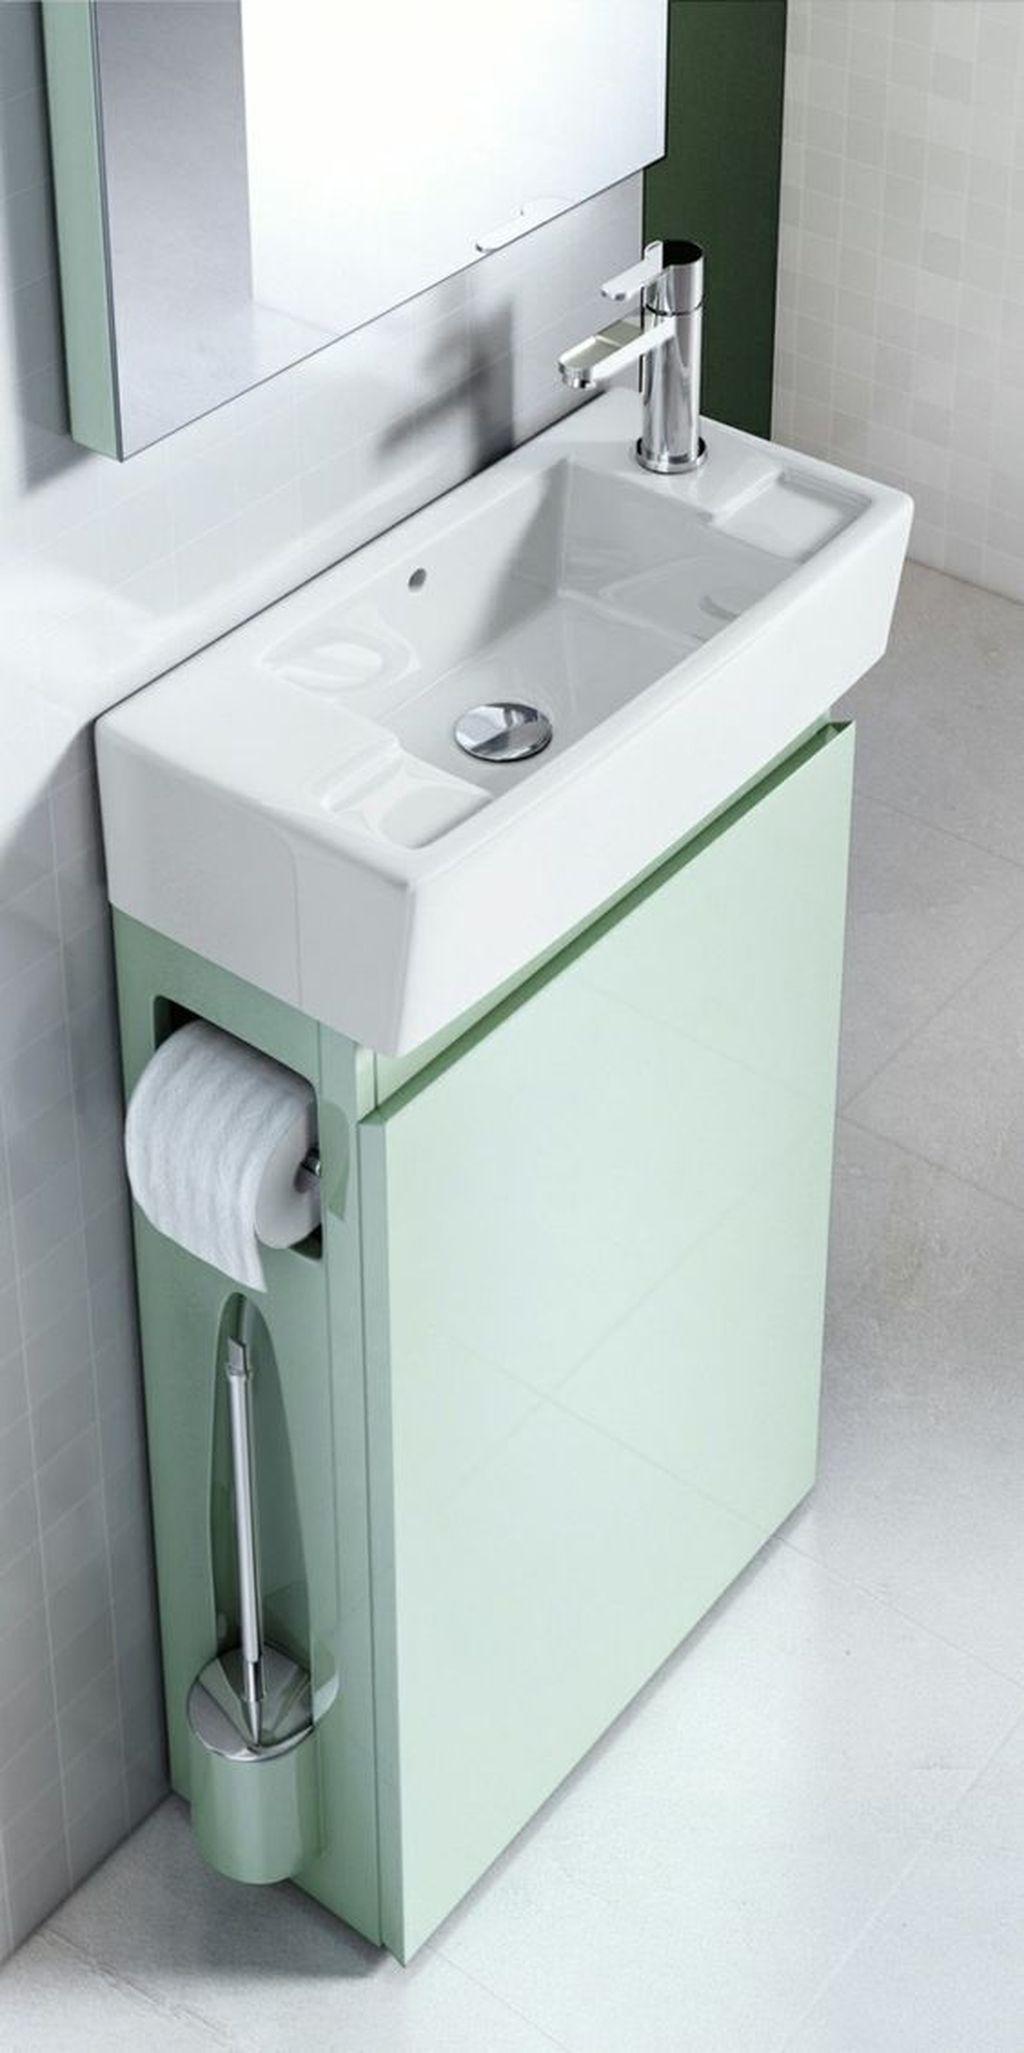 Badezimmer ideen über toilette tiny house storage hacks and ideas   furniture inspiration